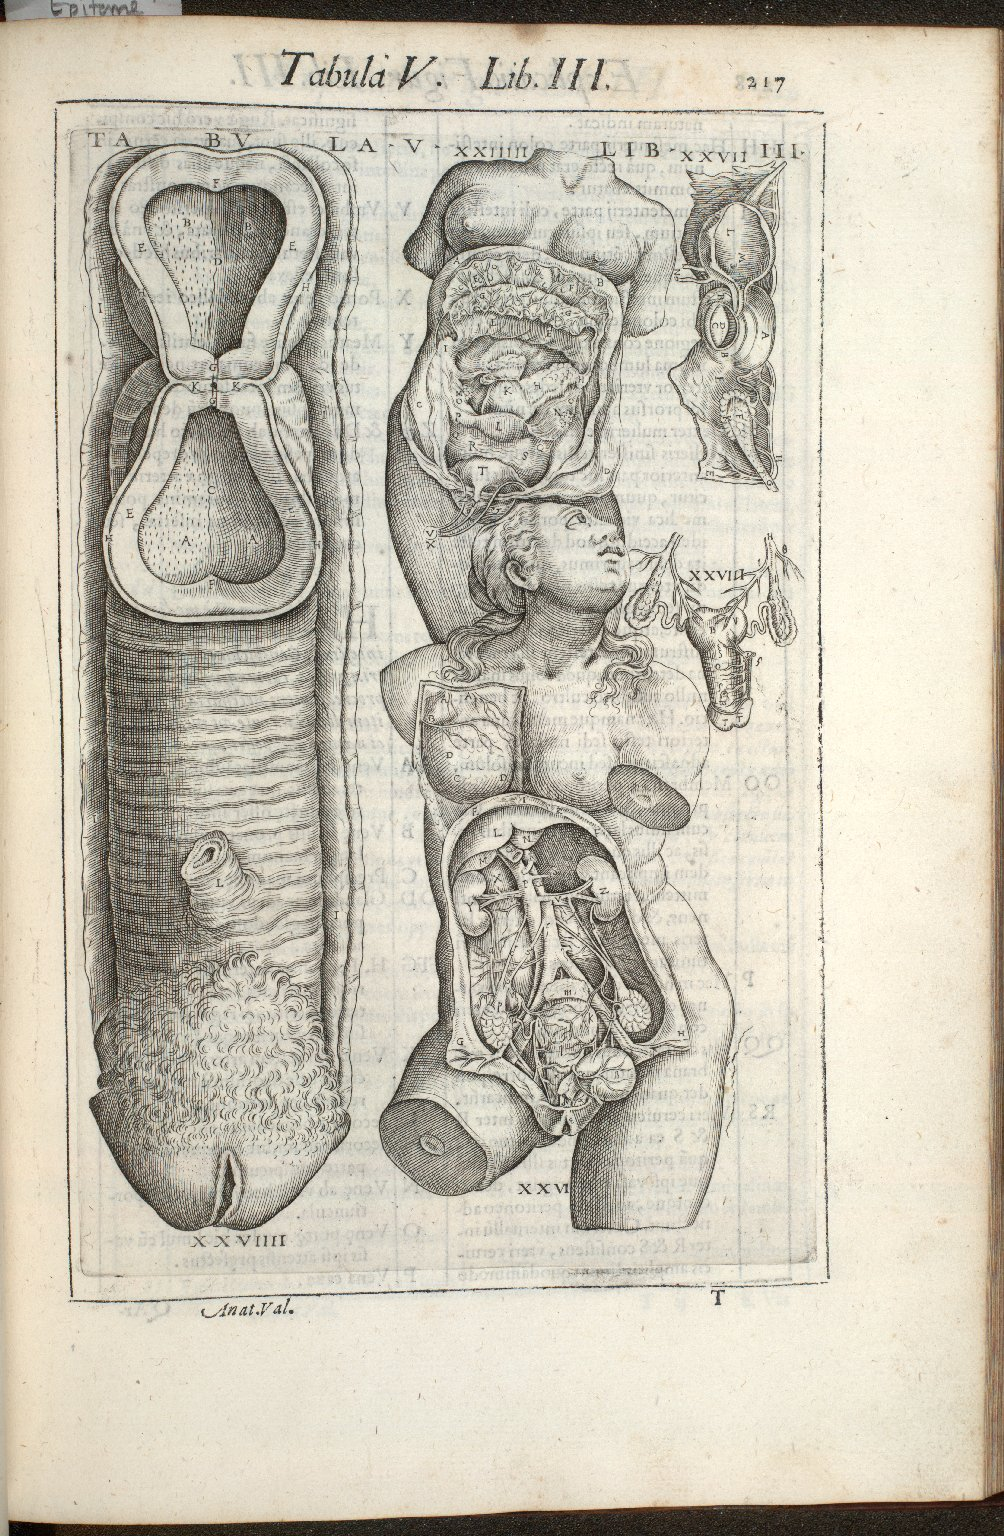 Tabula V. Libri III.